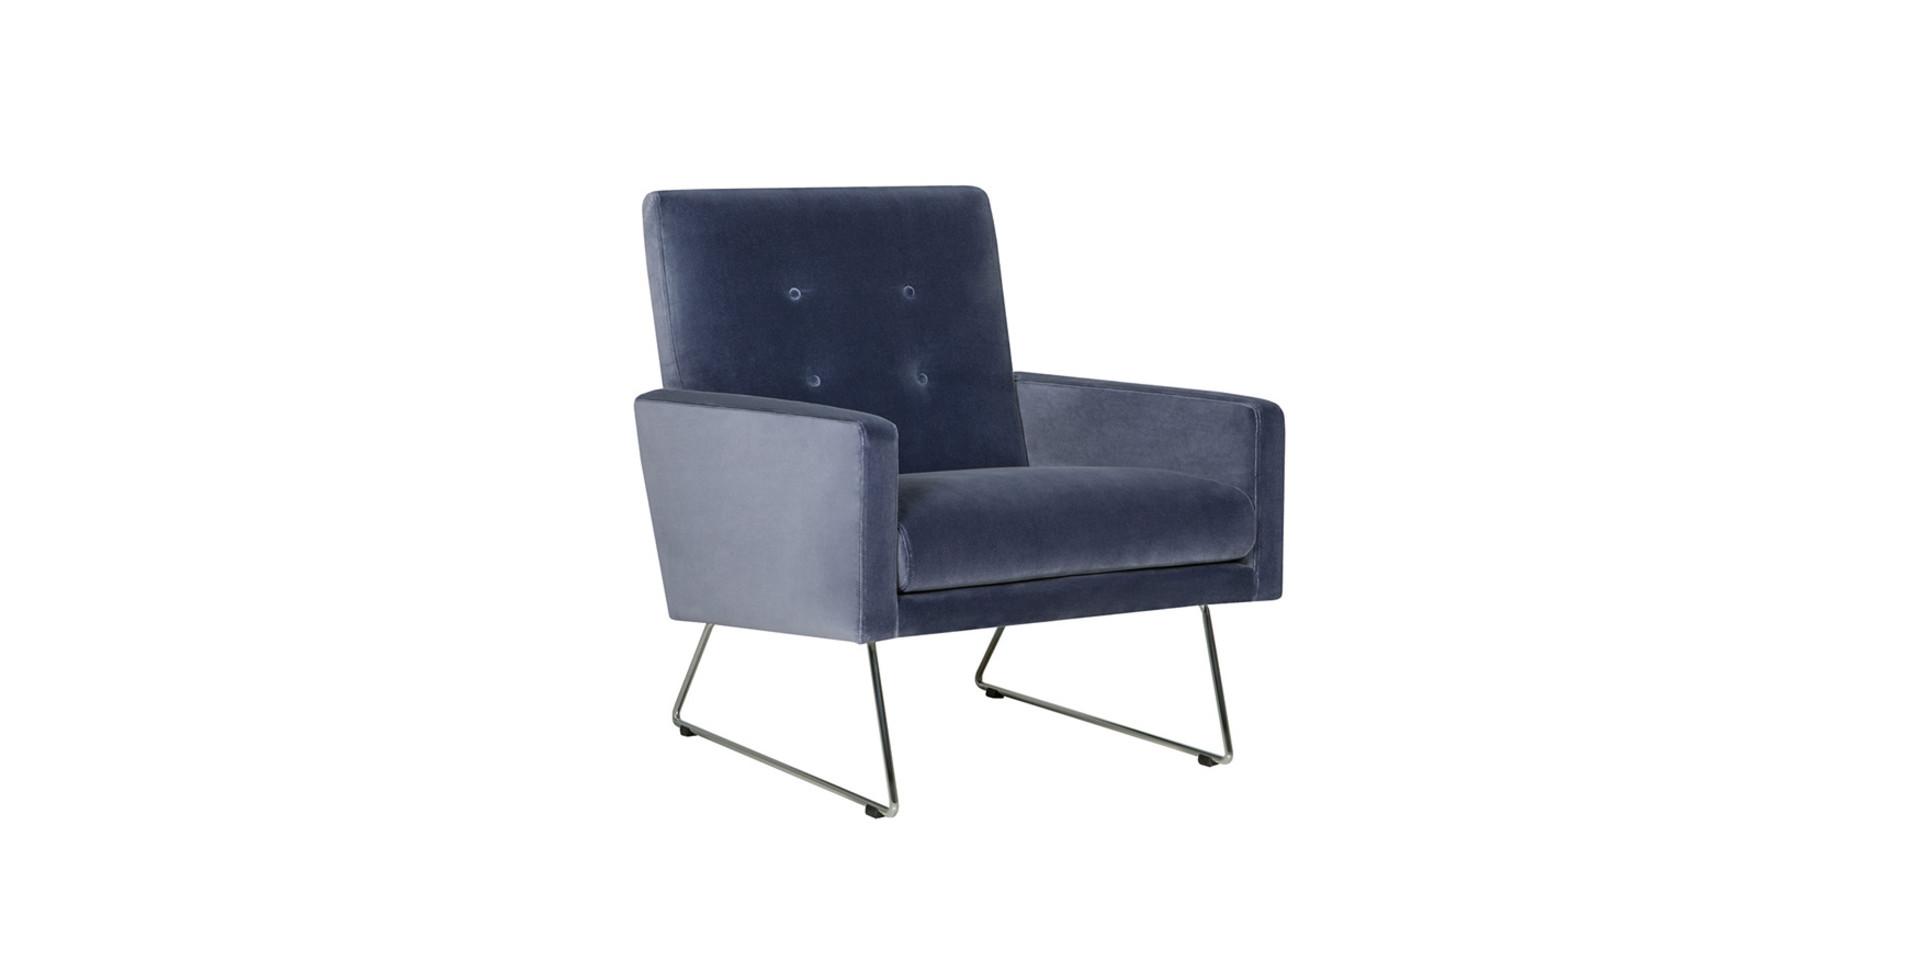 sits-max-fauteuil-buttons_lario20_indigo_2